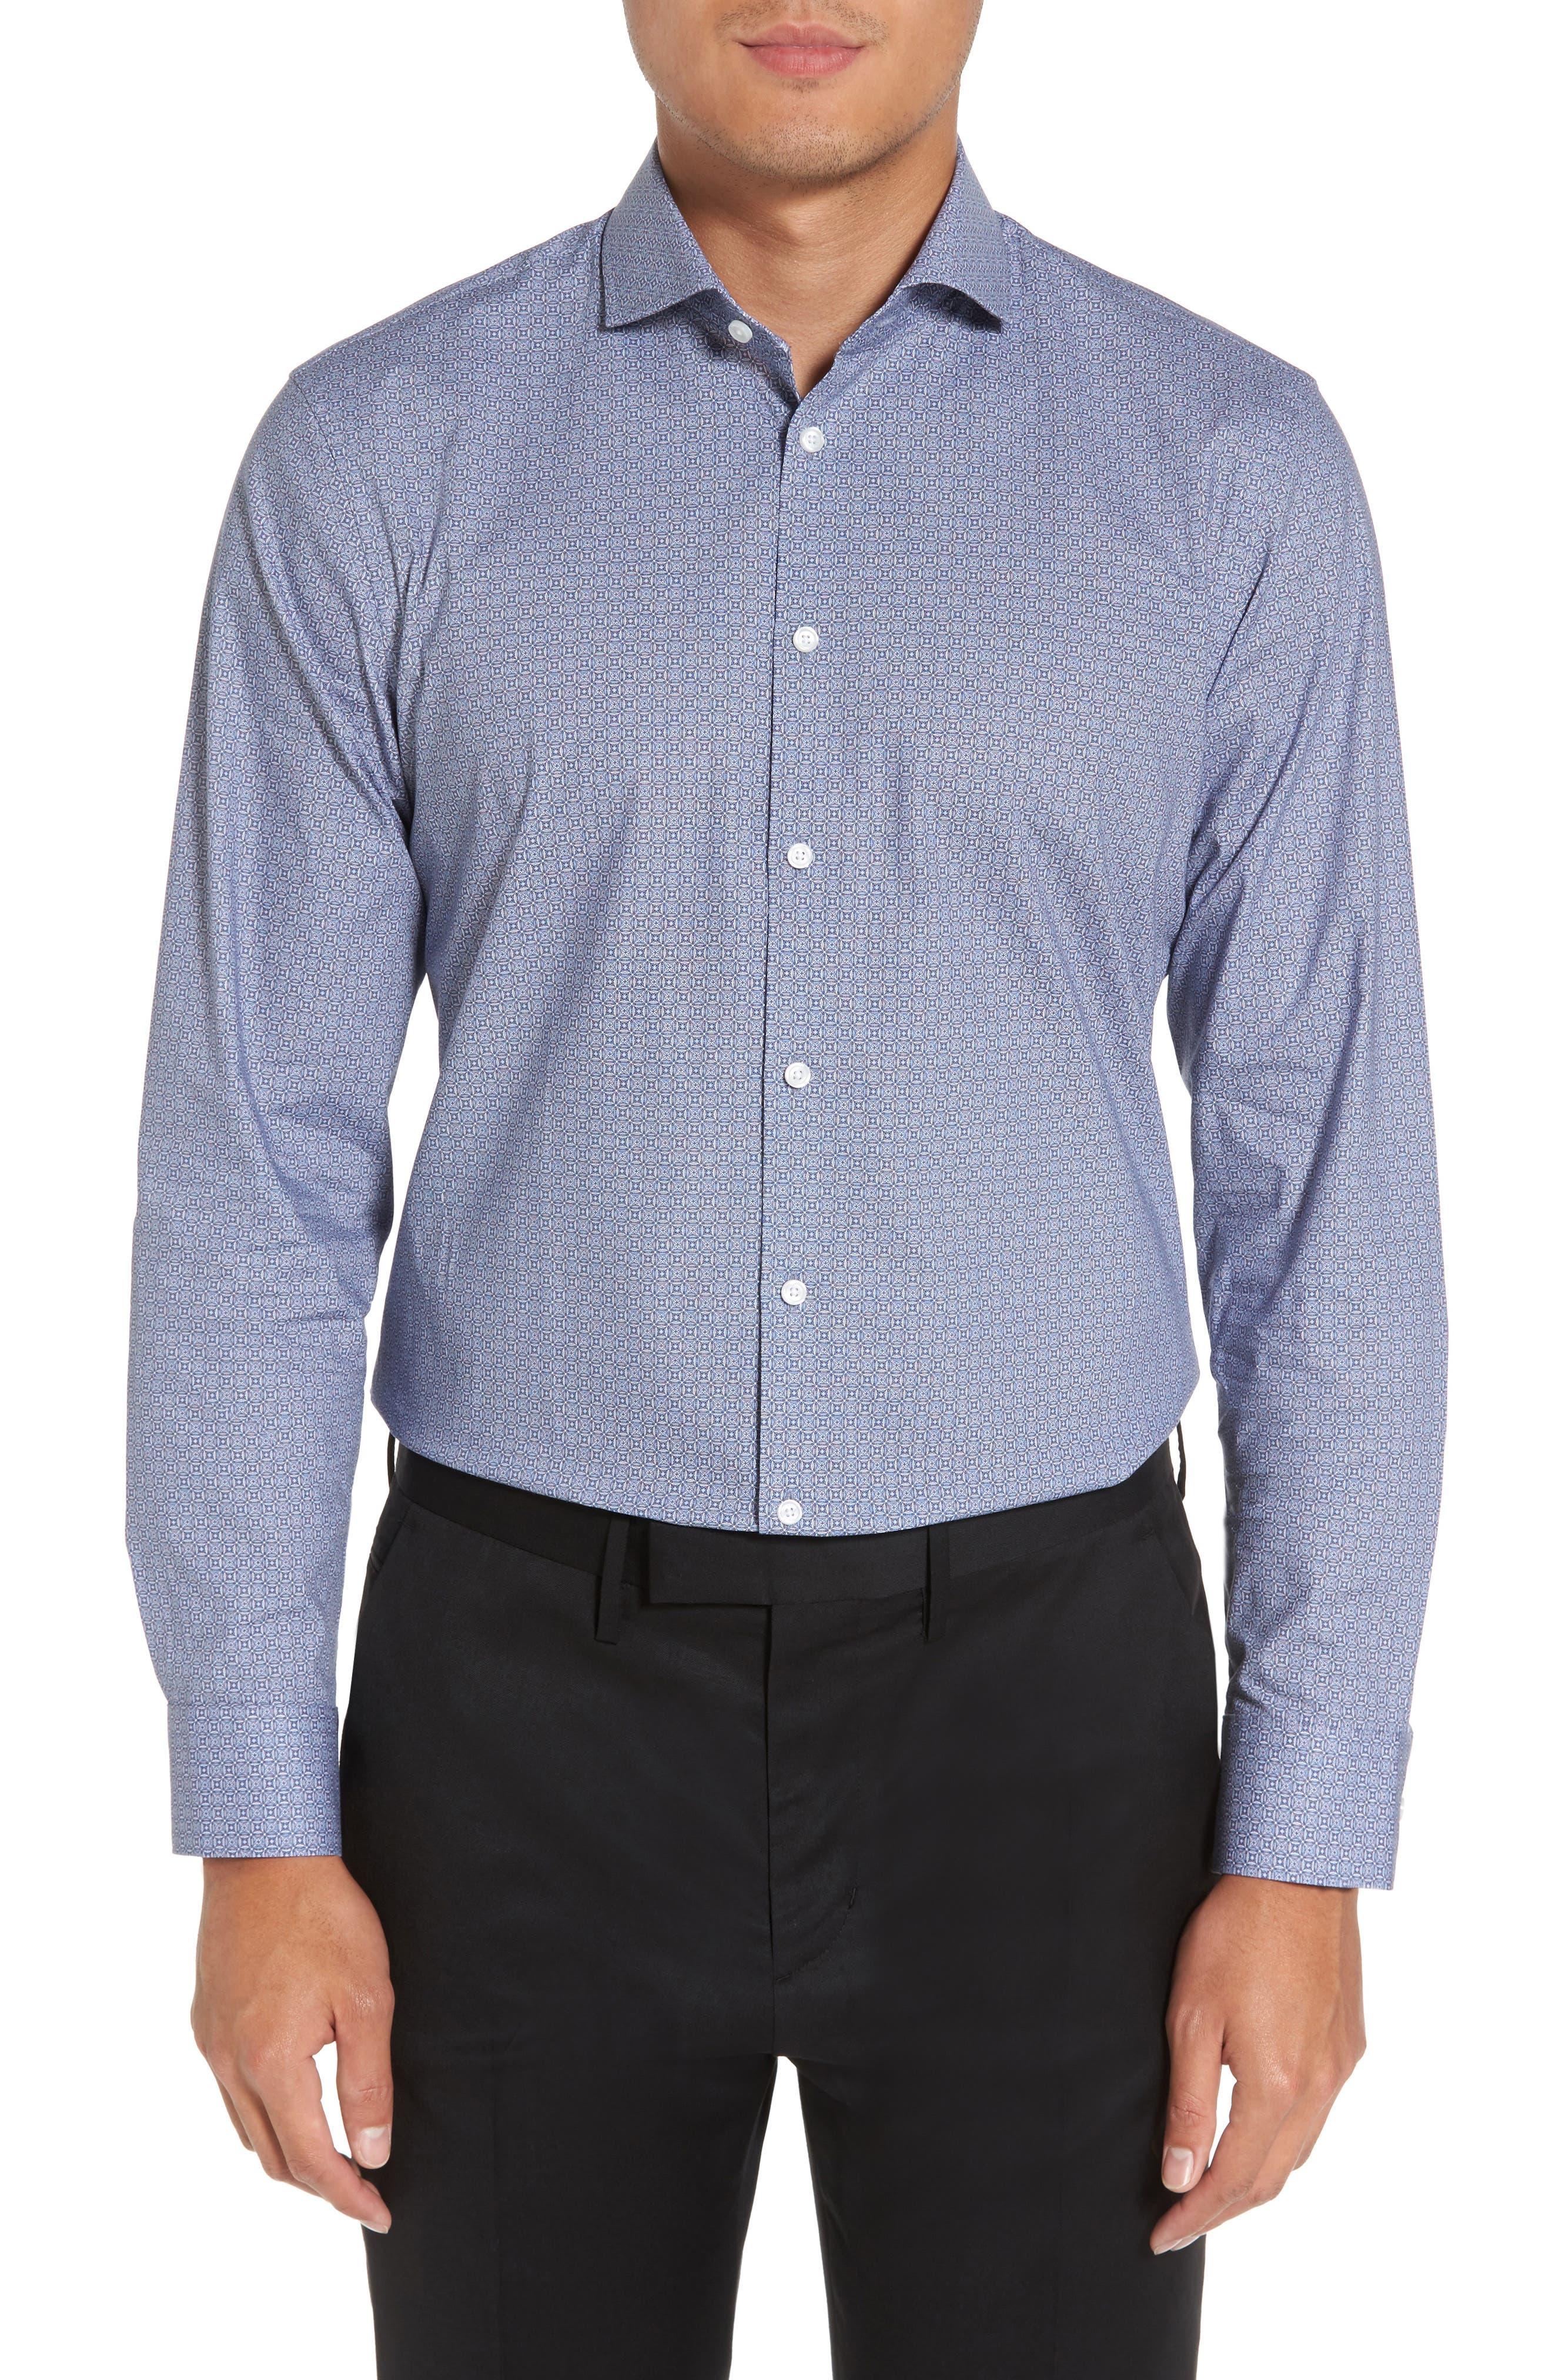 Extra Trim Fit Print Stretch Dress Shirt,                             Main thumbnail 1, color,                             410